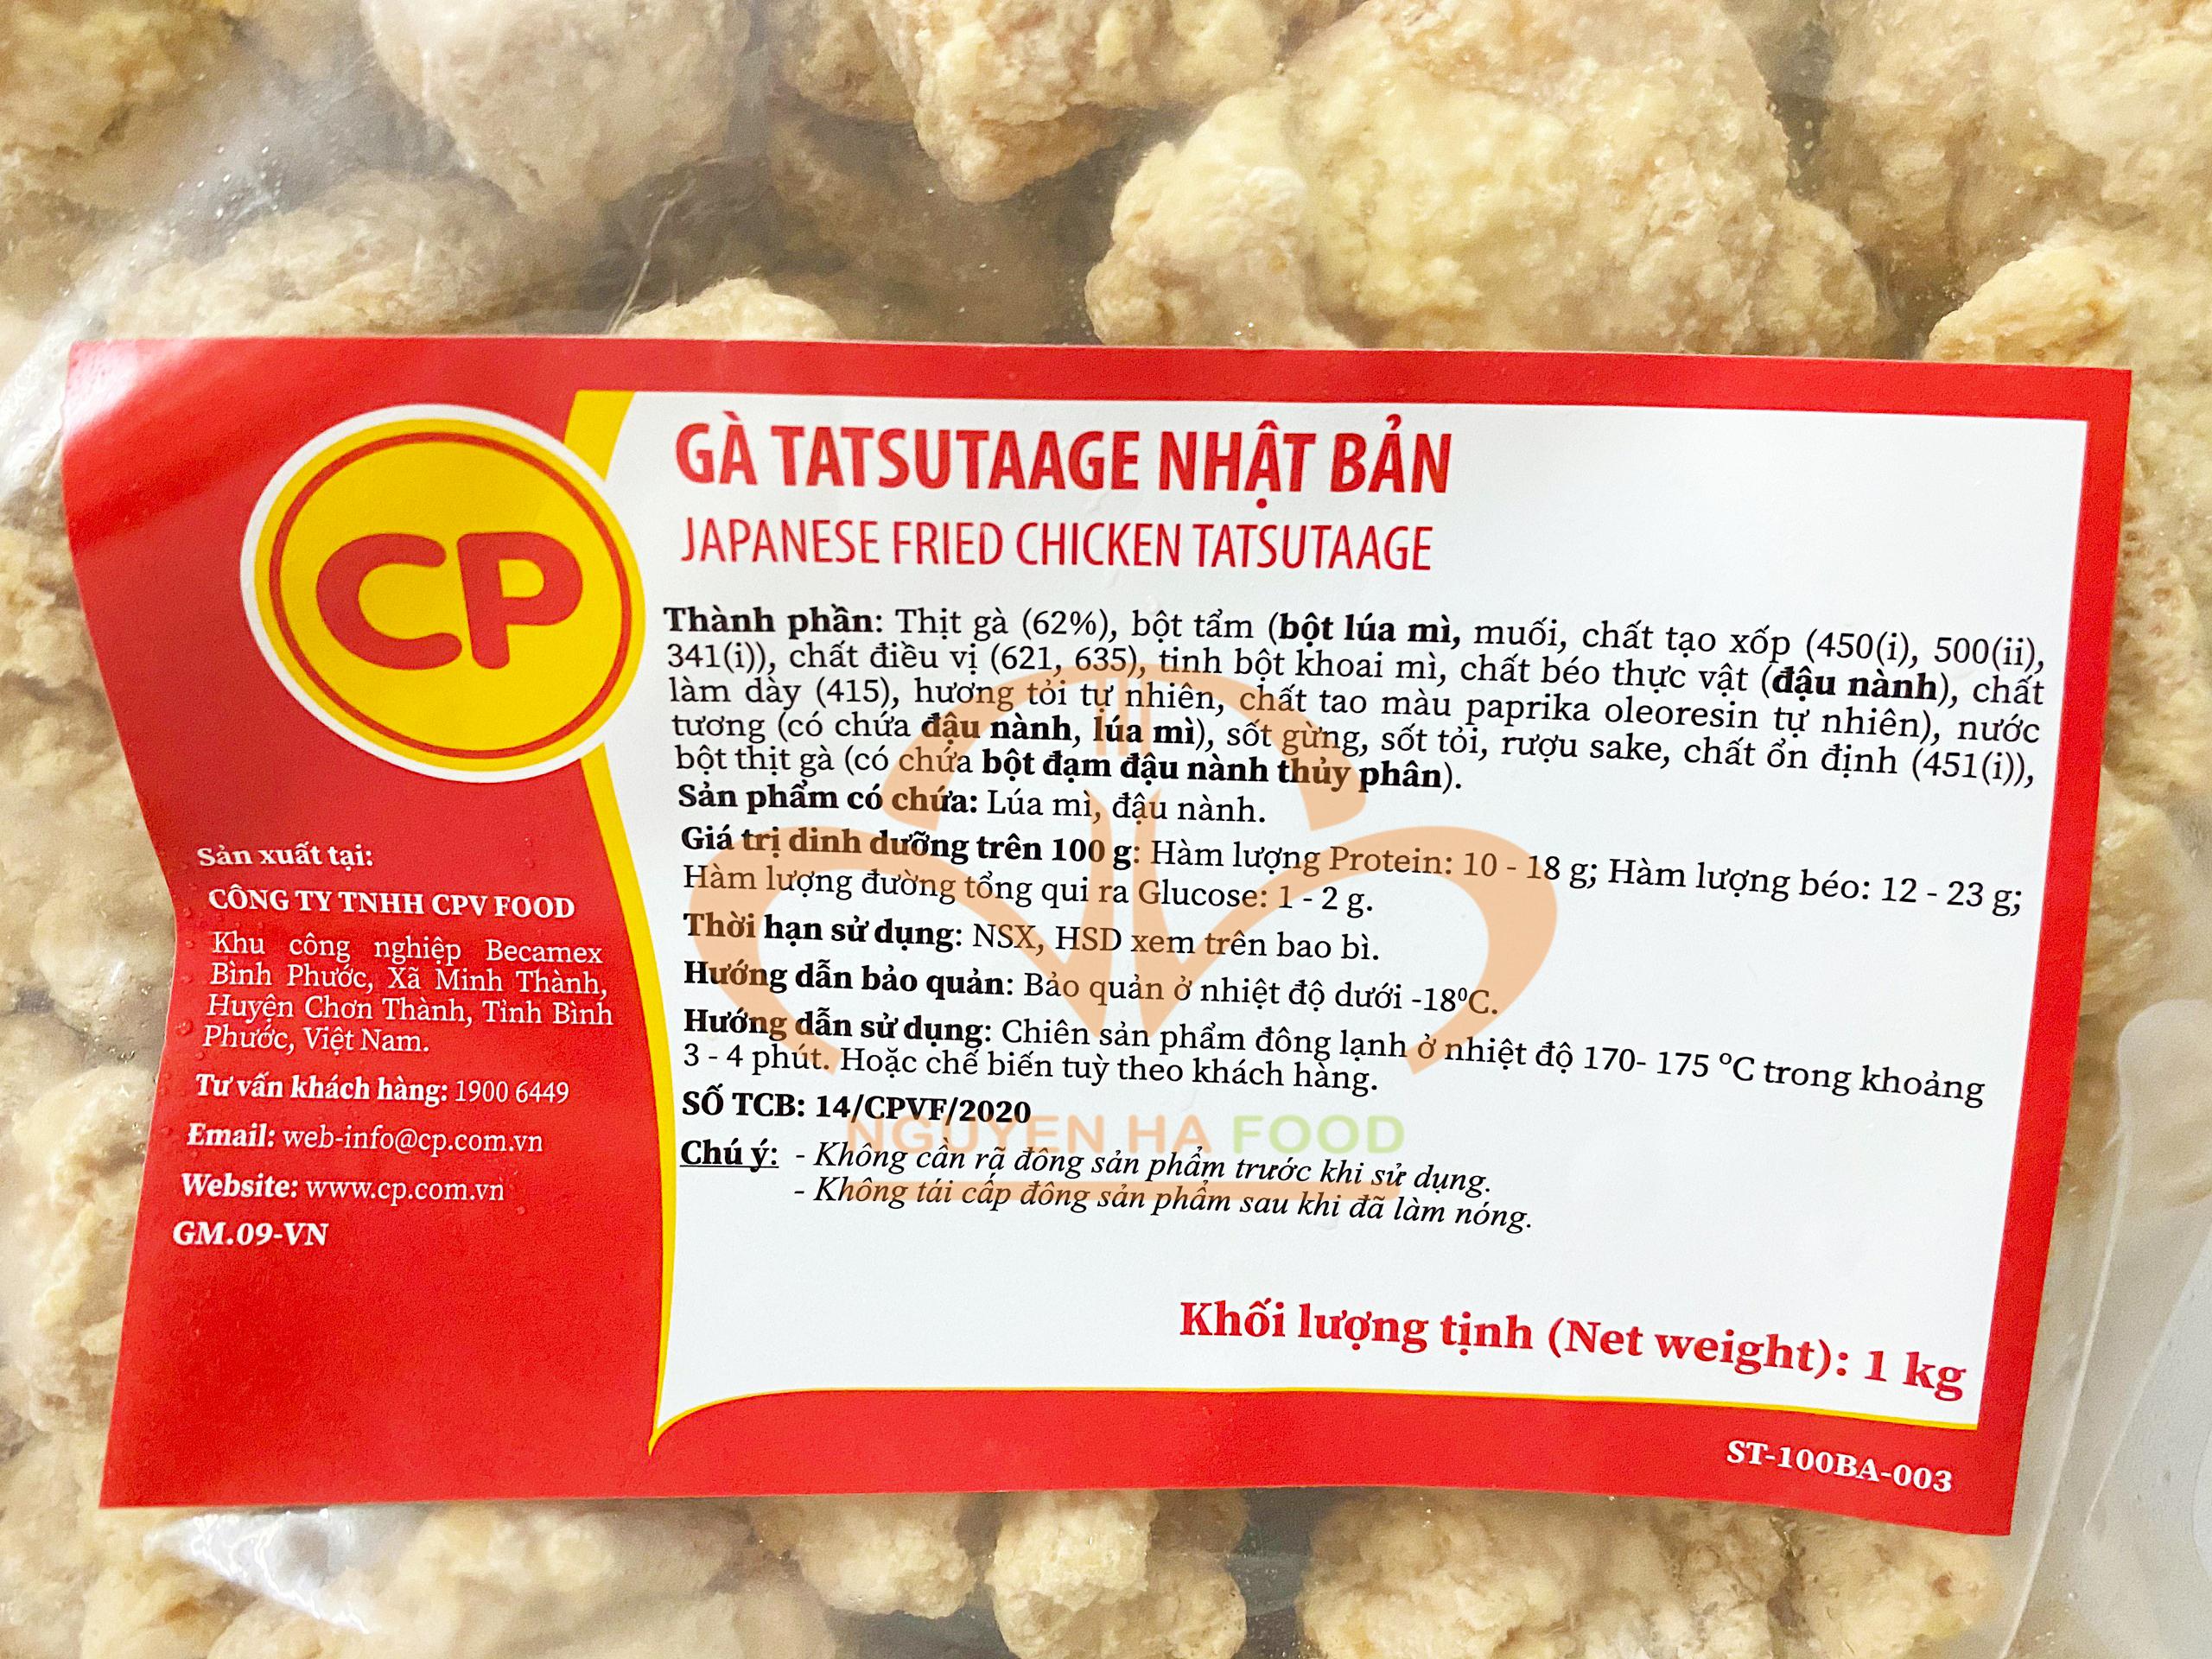 GA TATSUTAAGE NHAT BAN - JAPANESE FRIED CHICKEN TATSUTAAGE - NGUYEN HA FOOD - GA CHE BIEN SAN CP (3)